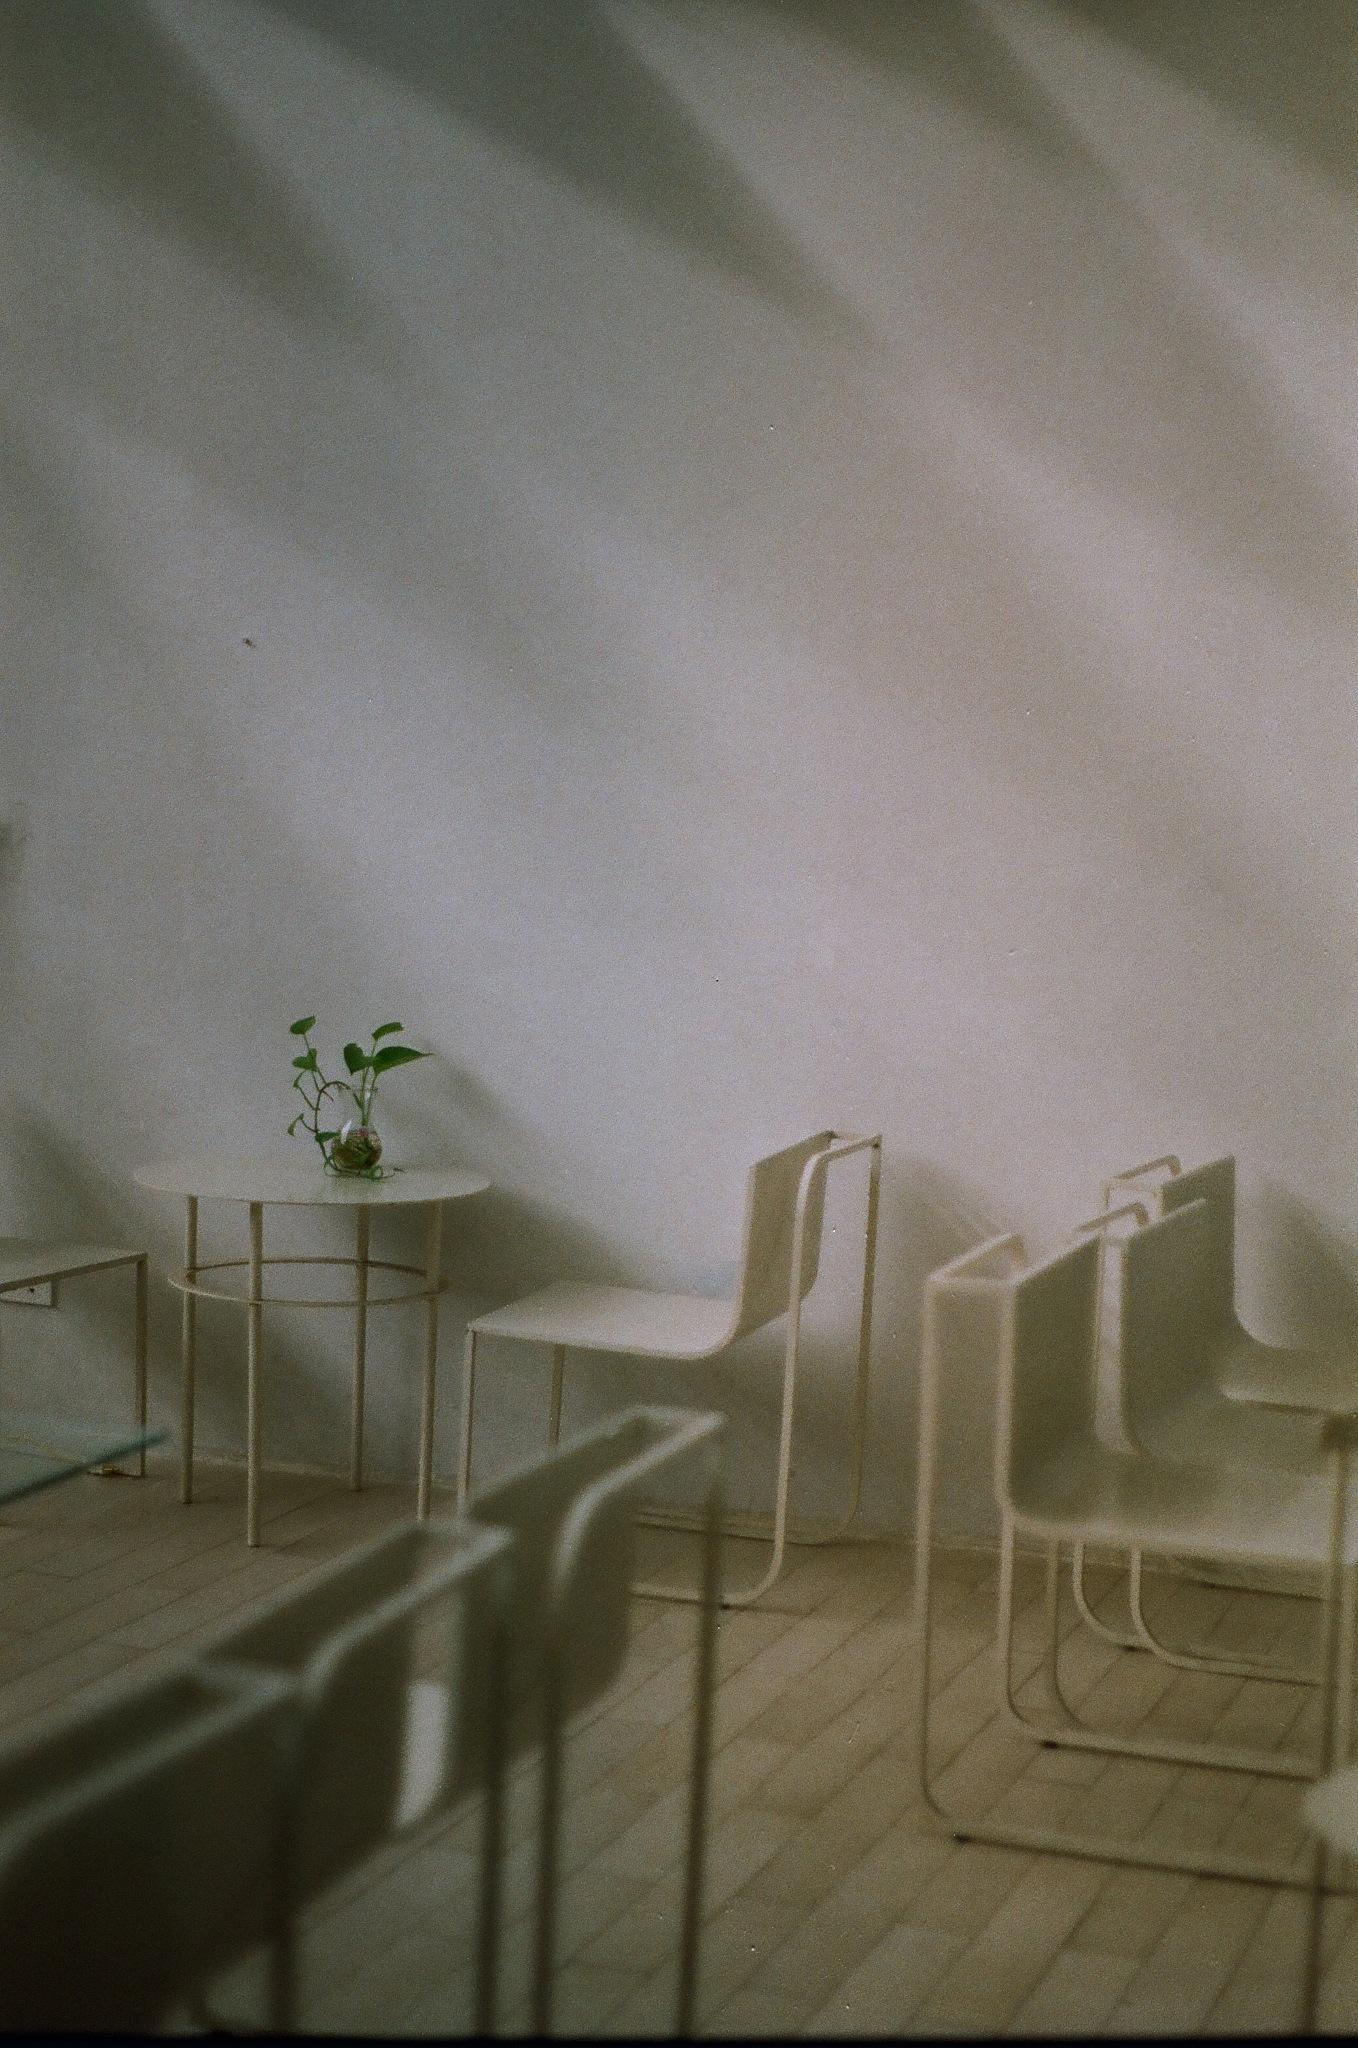 Untitled by Minh Châu